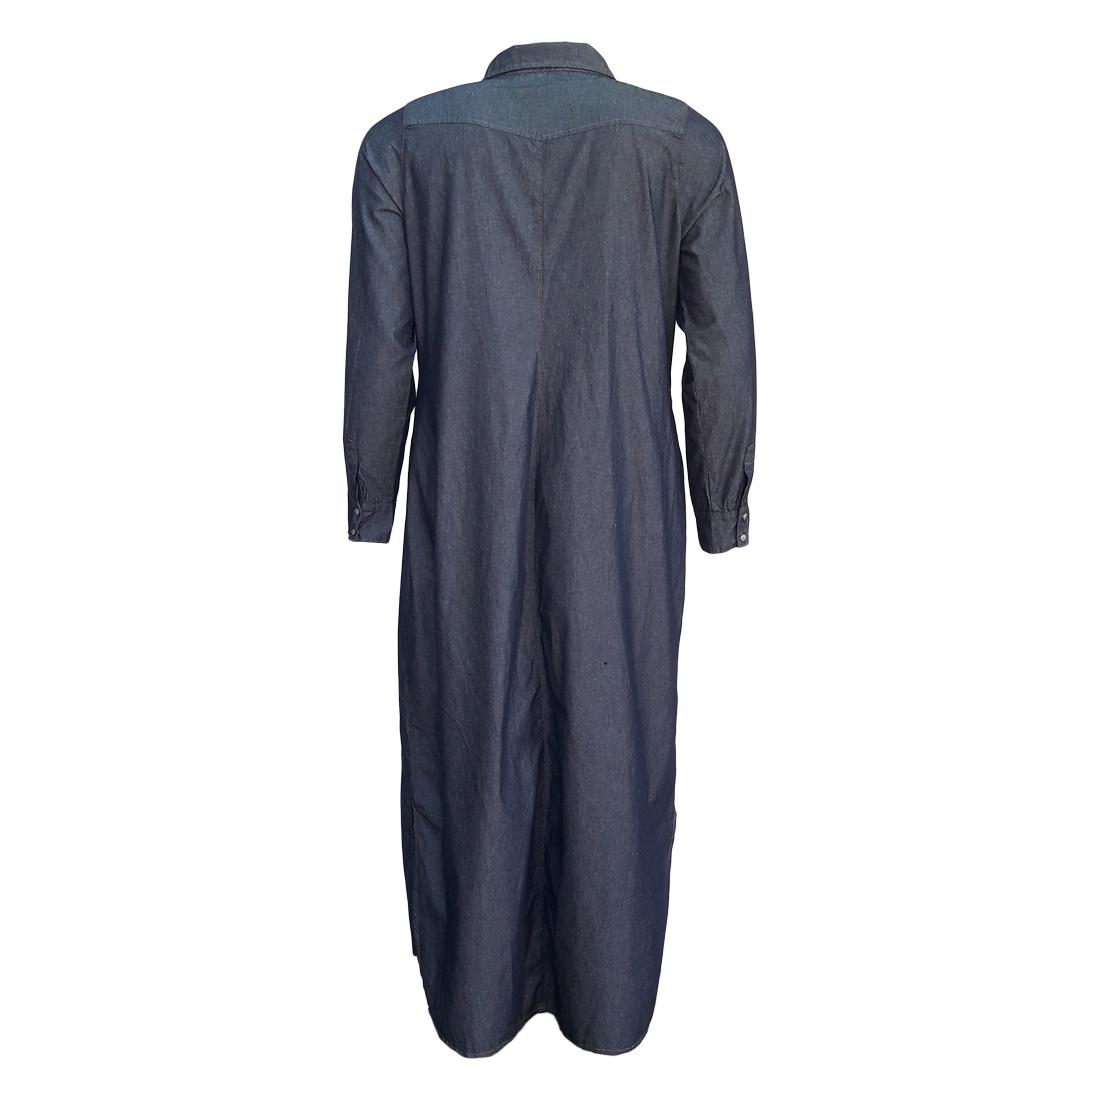 Vestido Jeans Chemisier Longo Moda Evangélica Plus Size